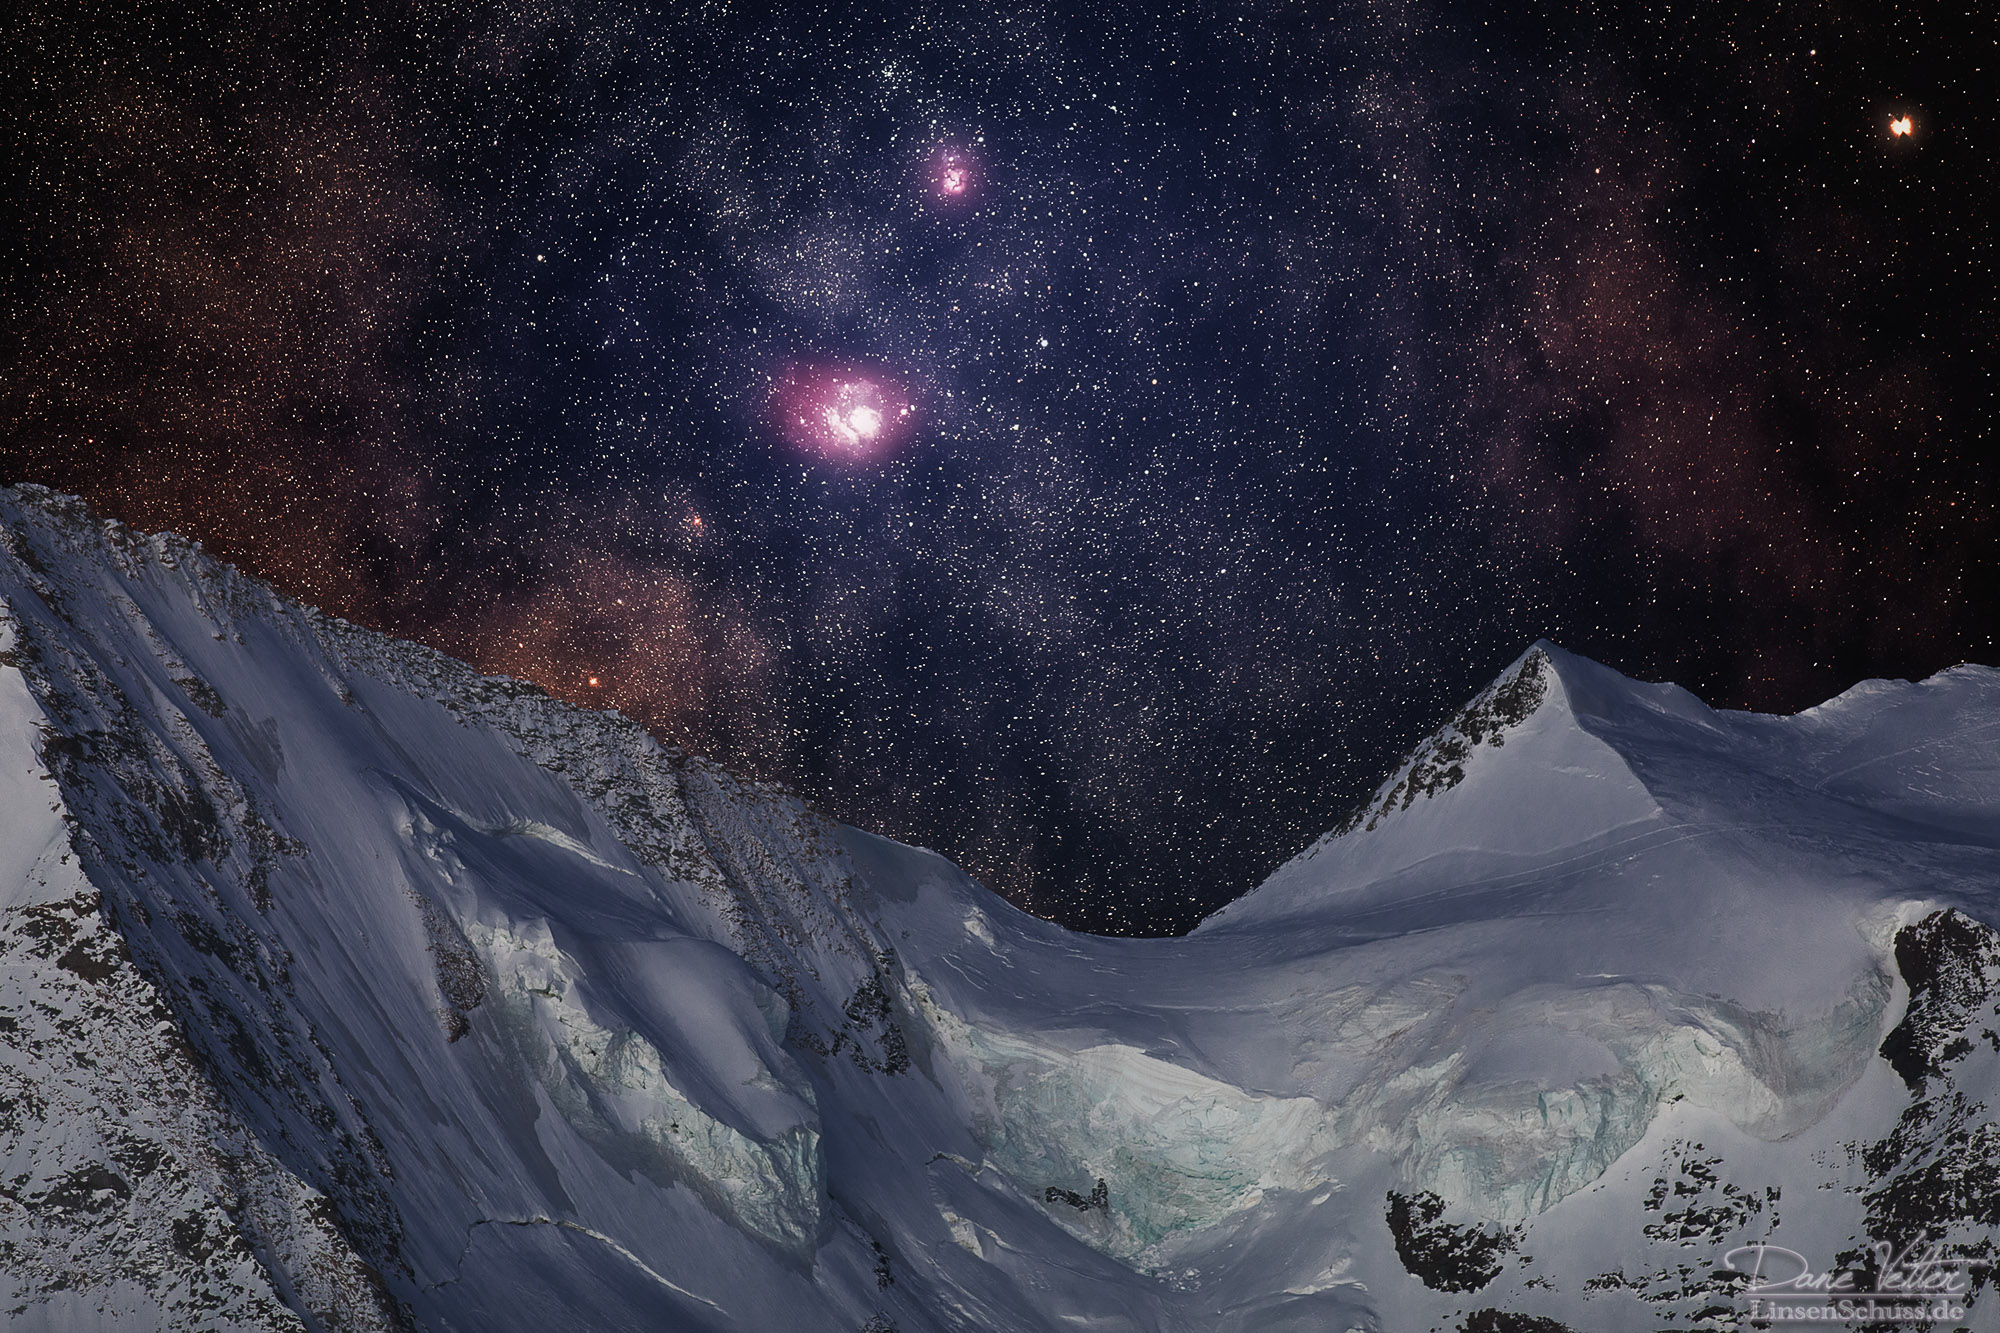 lagoon trifid nebula - photo #2